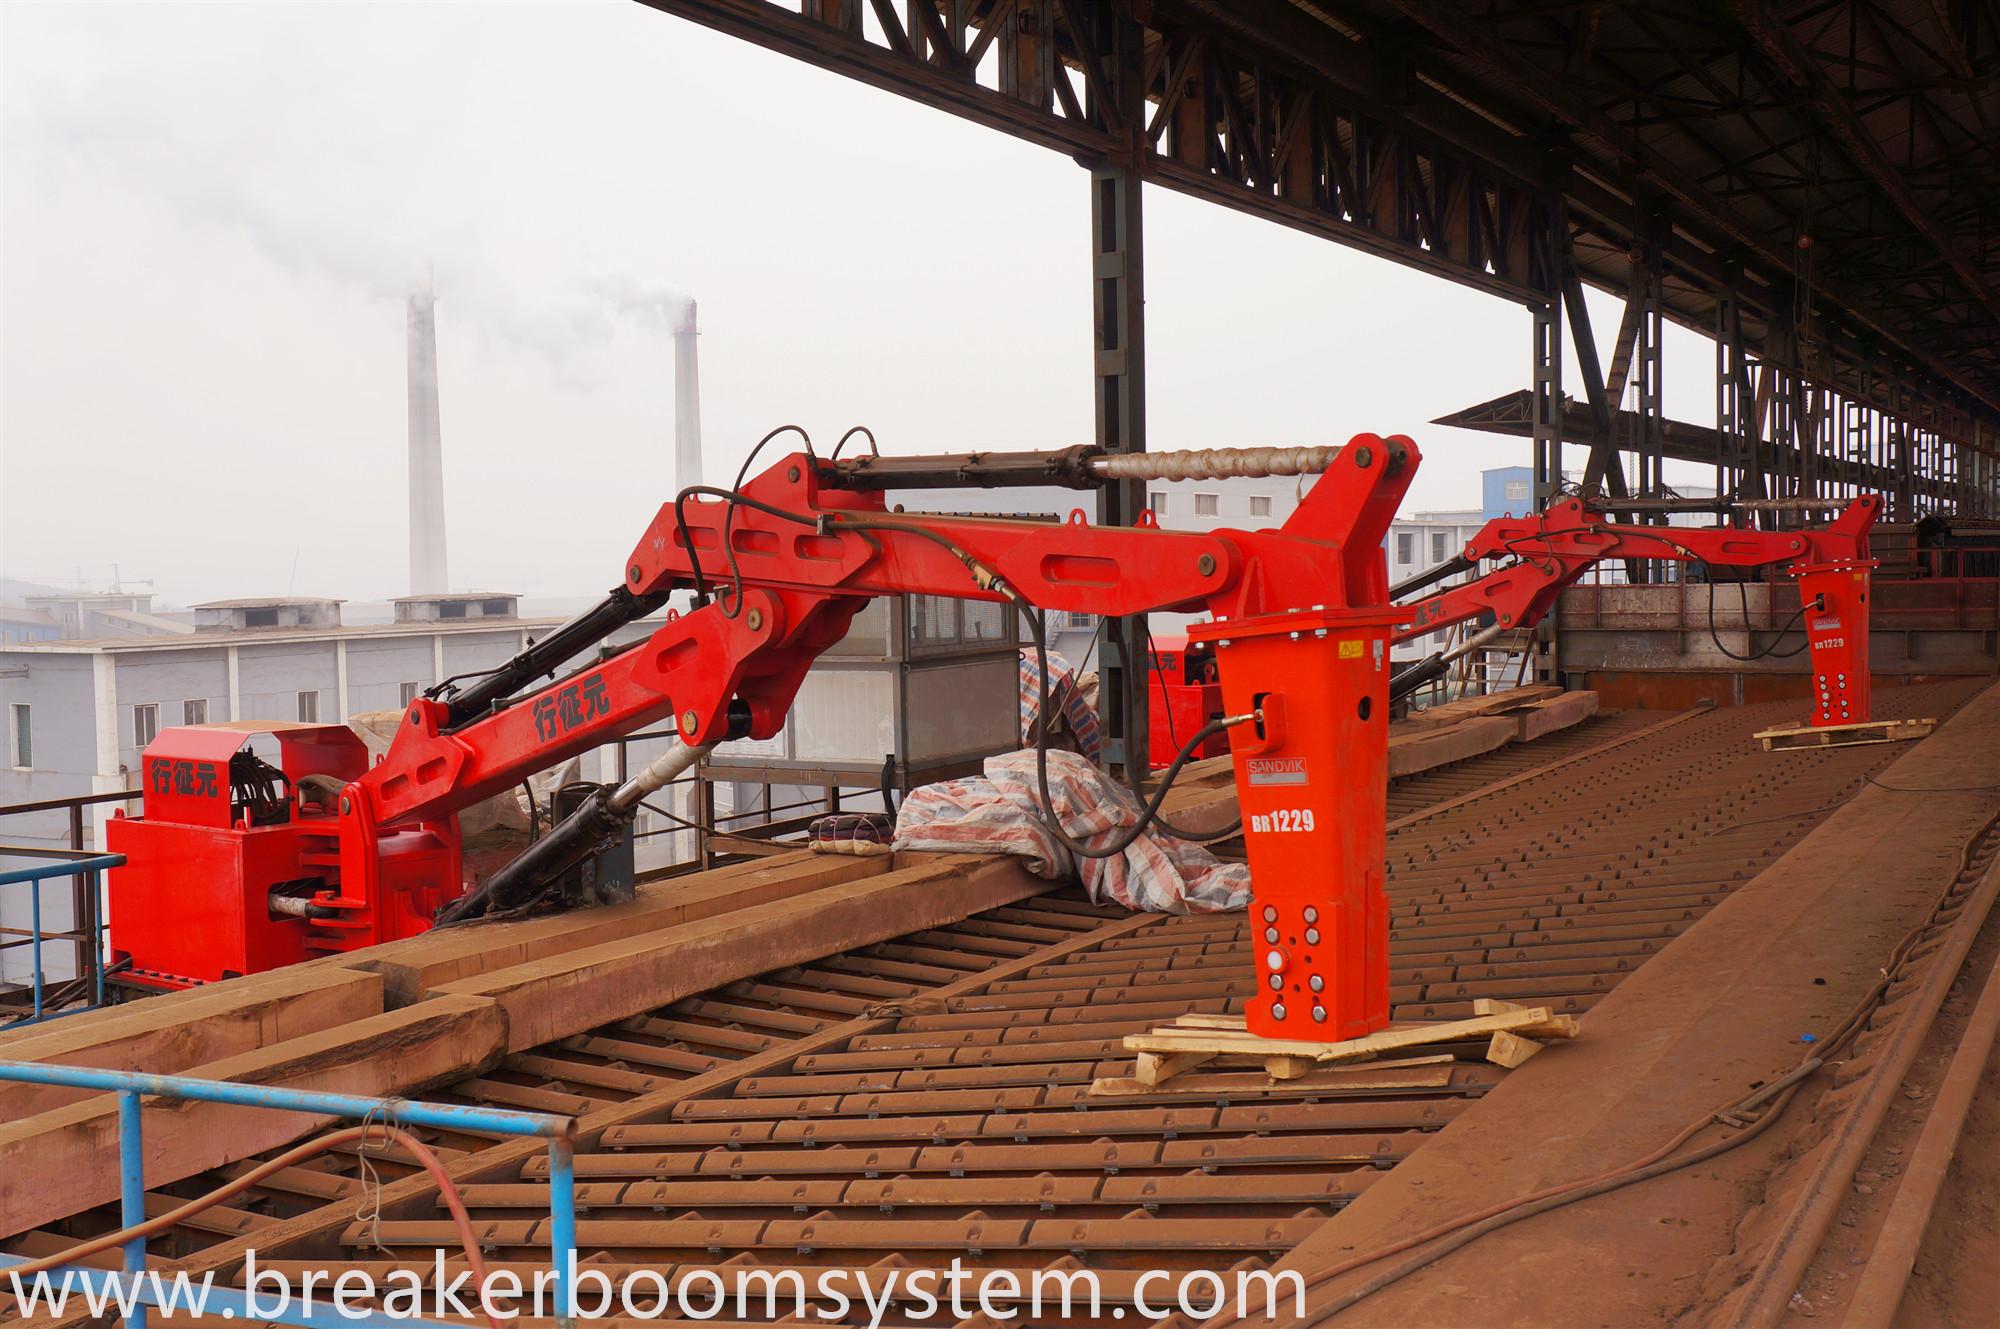 Hydraulic Rock Breaker Booms System